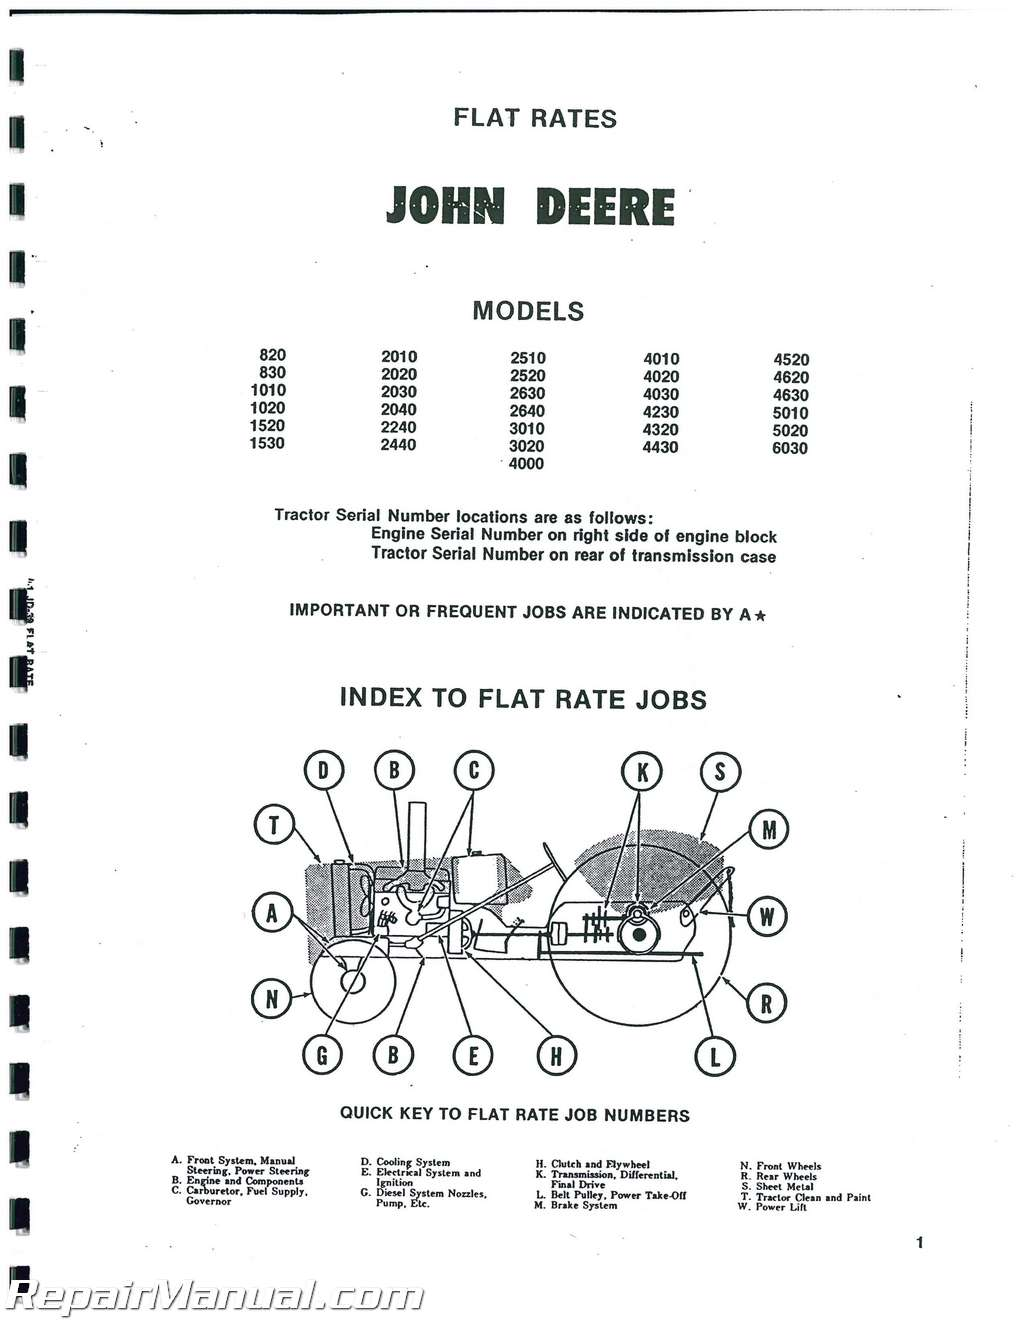 Jd 1020 Wiring Diagram John Deere Alternator Wiring Diagram ... Electrical Wiring Diagram John Deere Tractor on